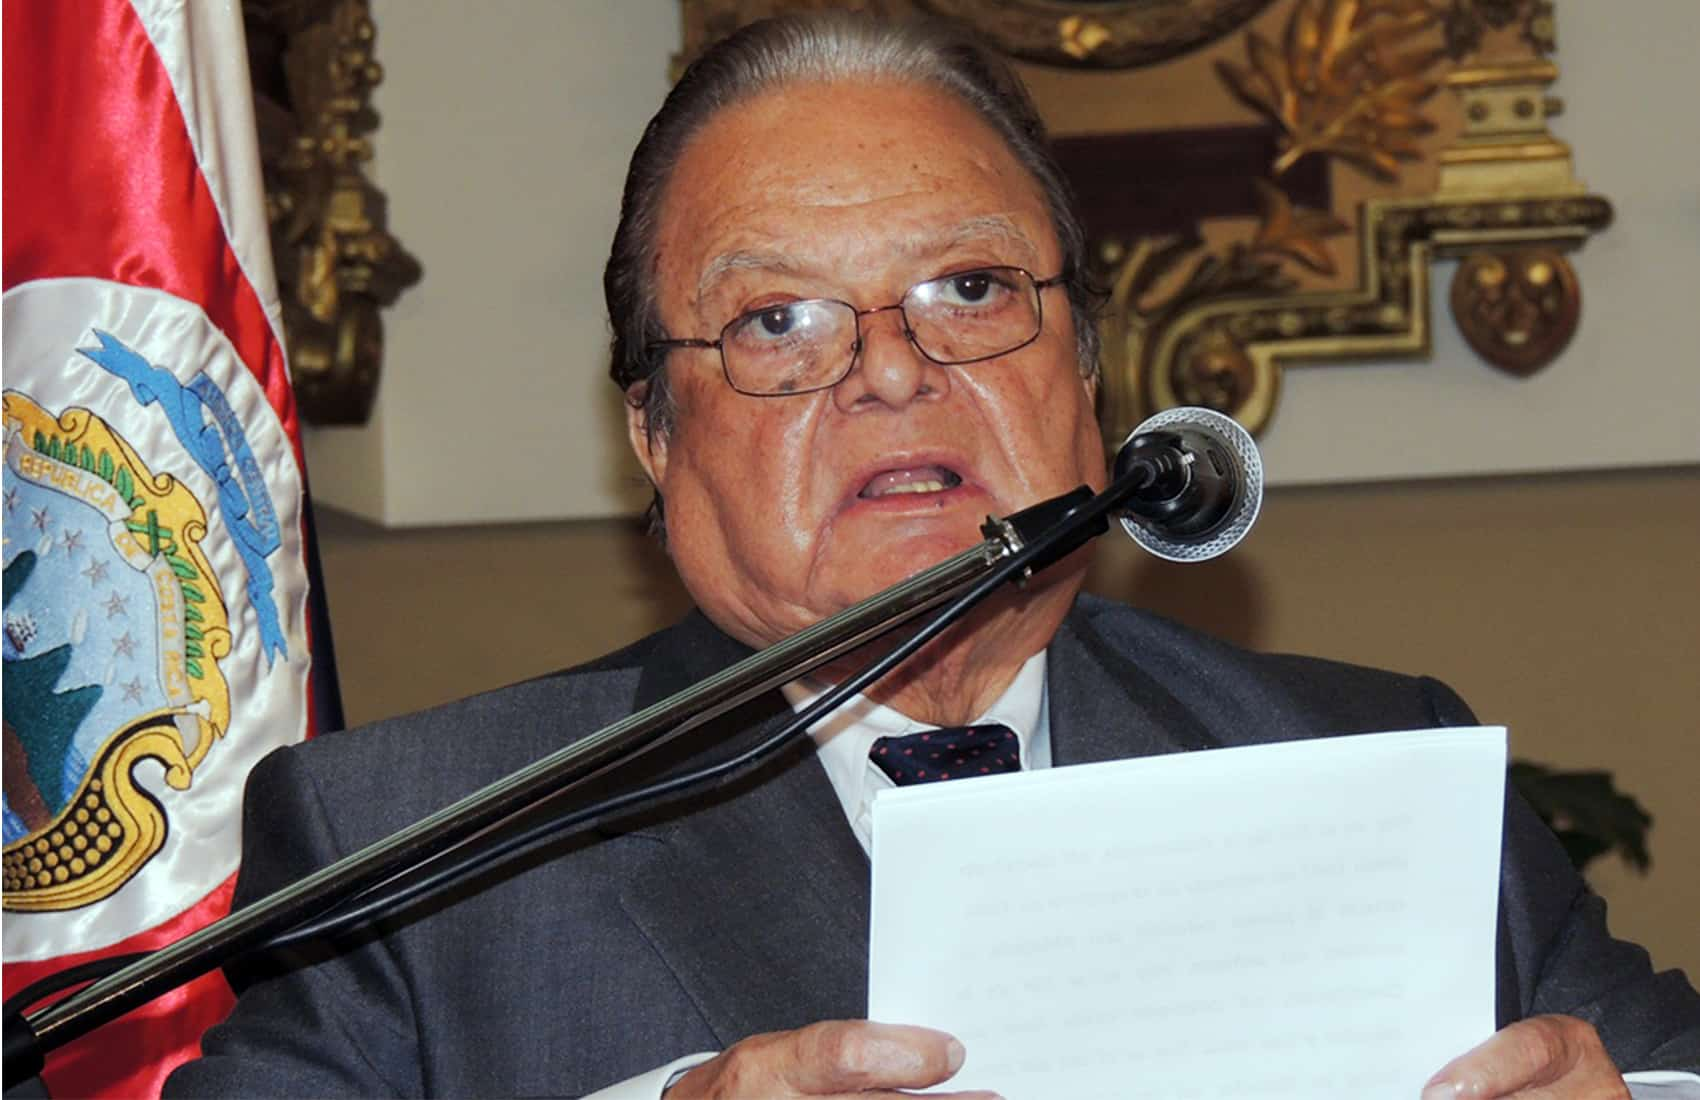 Ex-President Luis Alberto Monge Álvarez